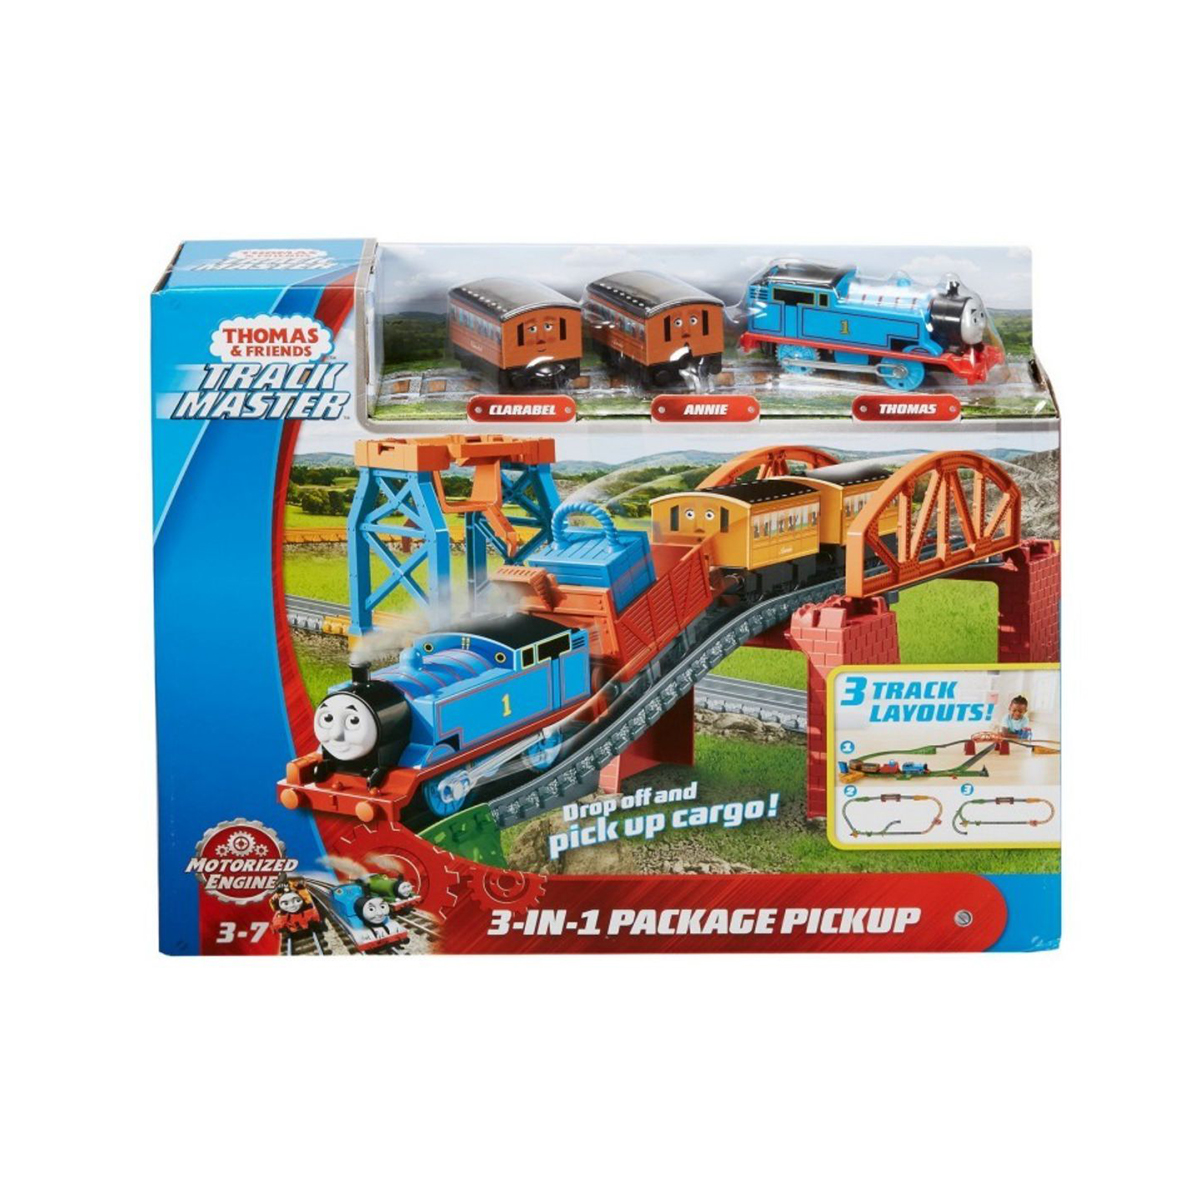 Set de joaca 3 in 1, Thomas and Friends, Track Master